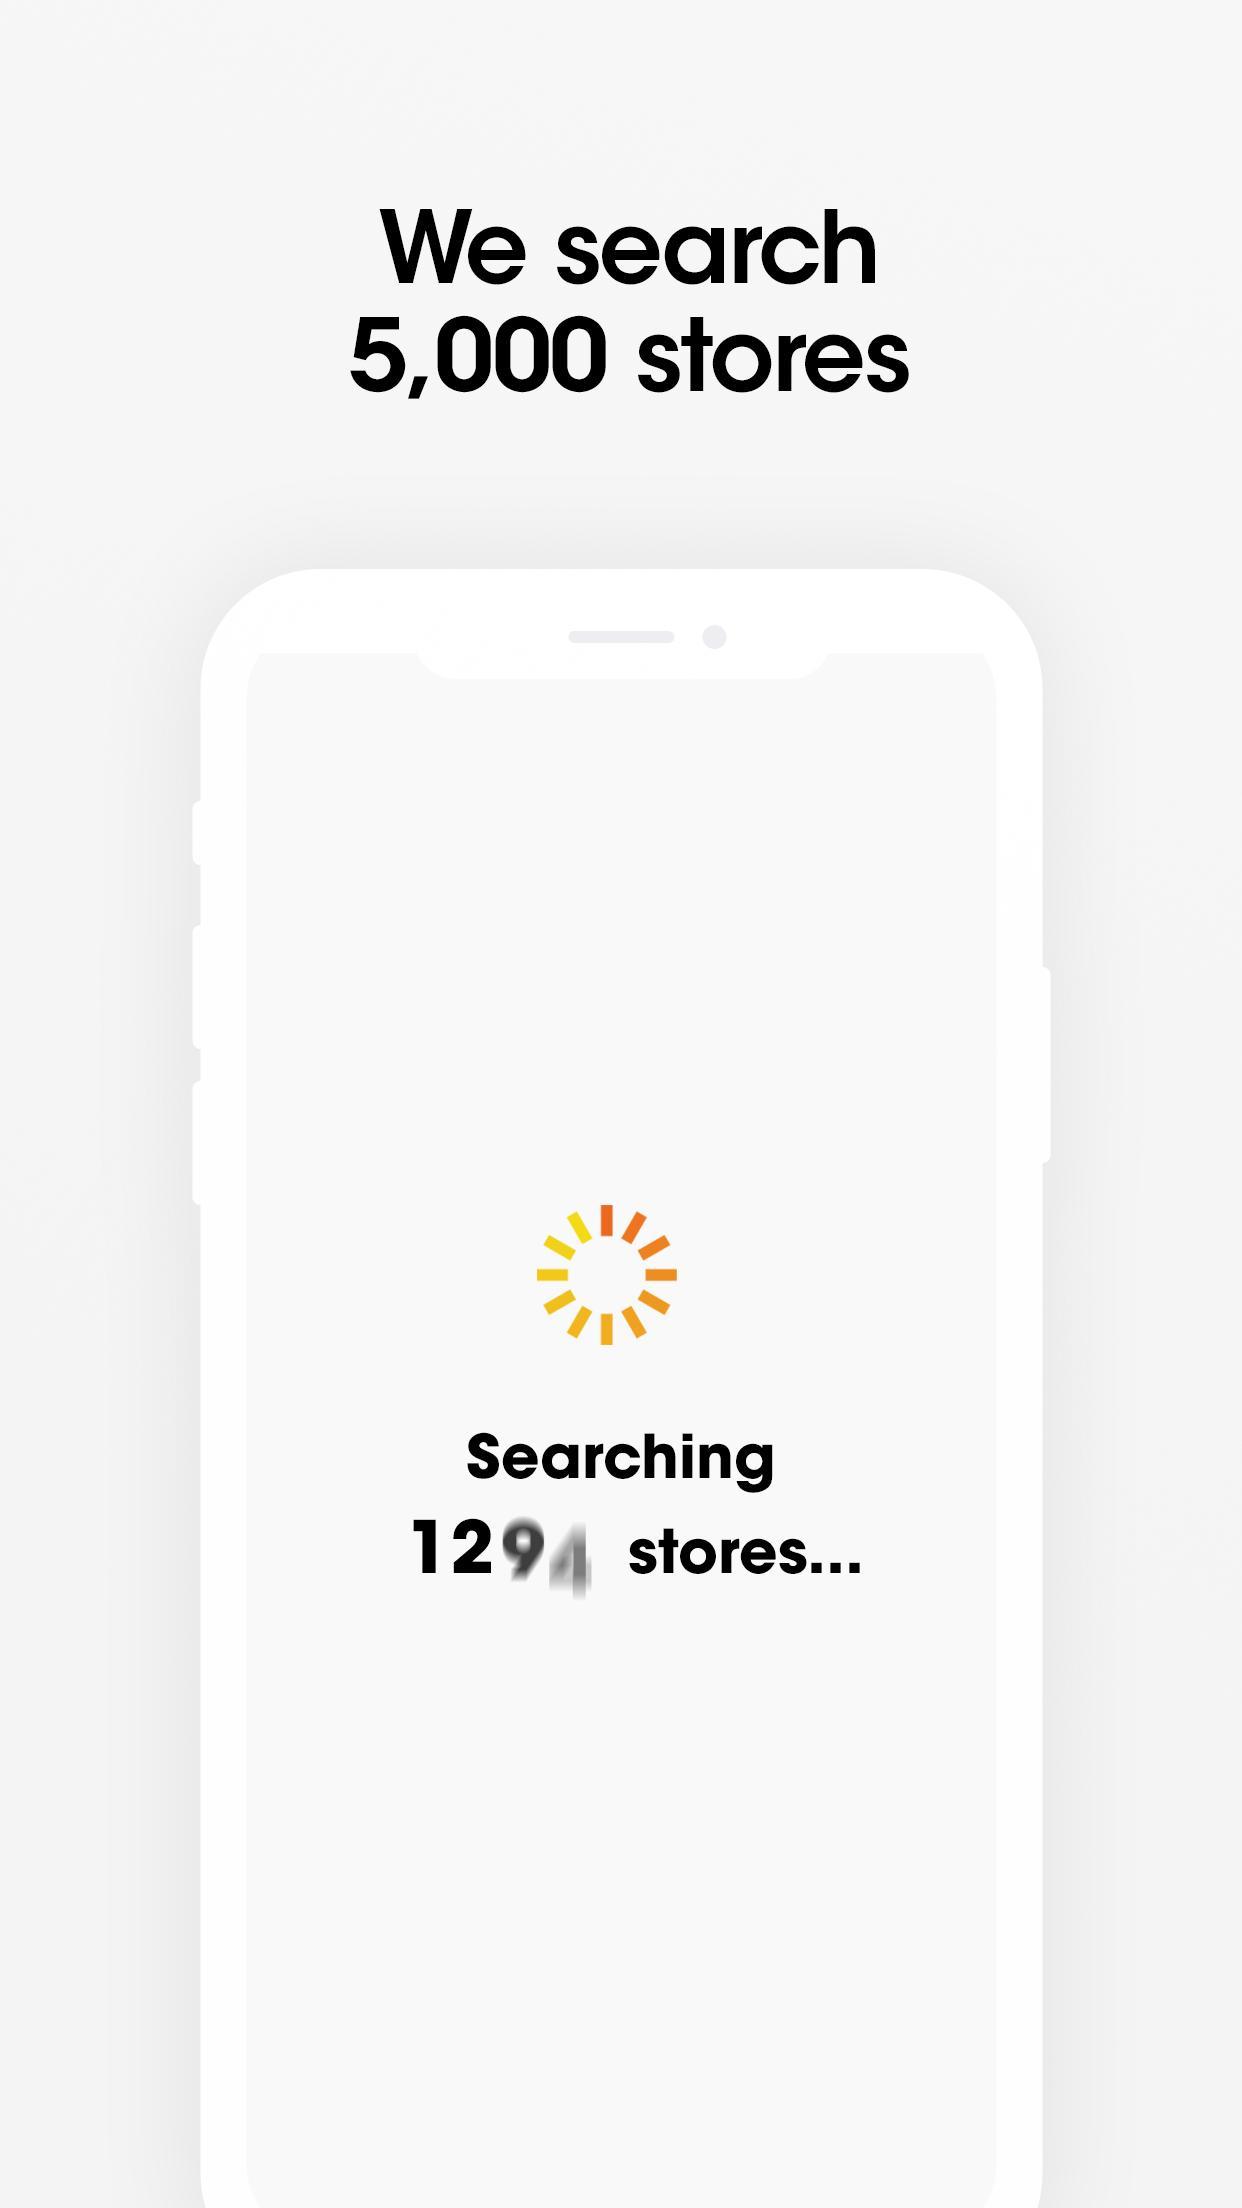 Autumn App - Fashion & Home Decor 1.16.0 Screenshot 2